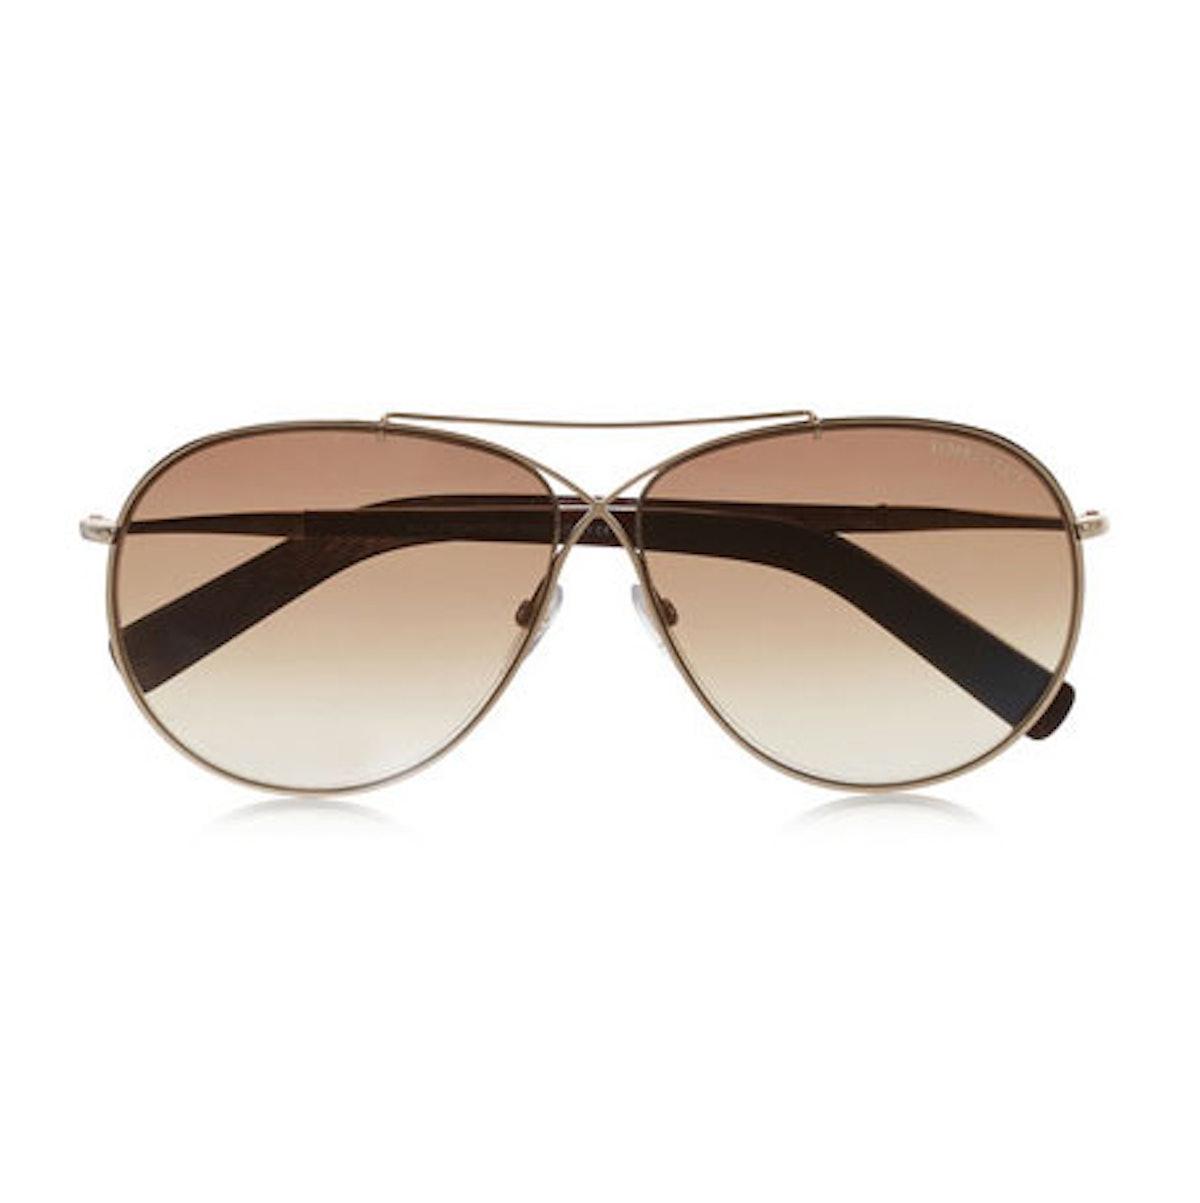 Tom Ford Eva aviator style gold-tone sunglasses